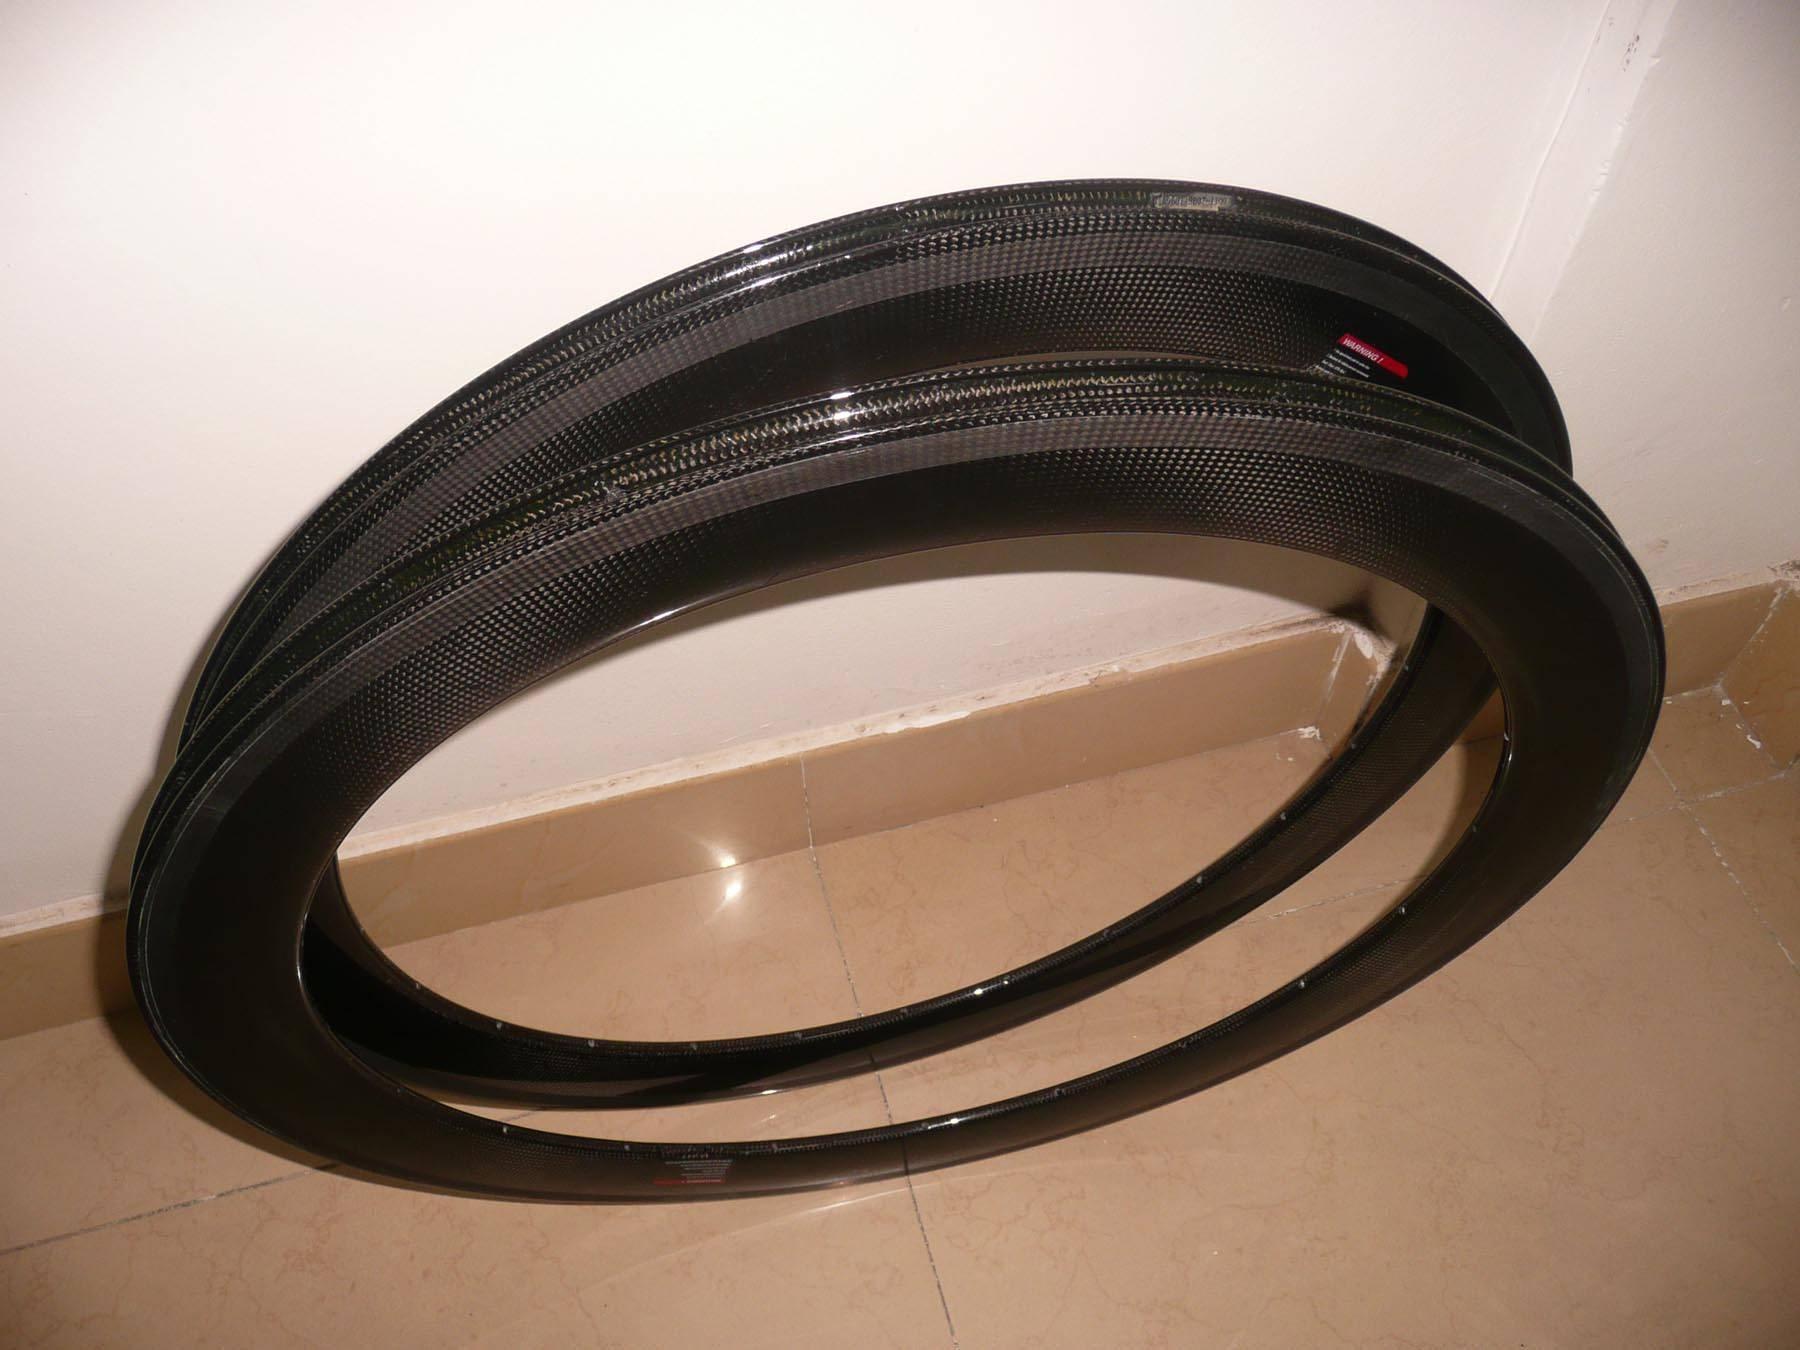 Carbon tubular rim